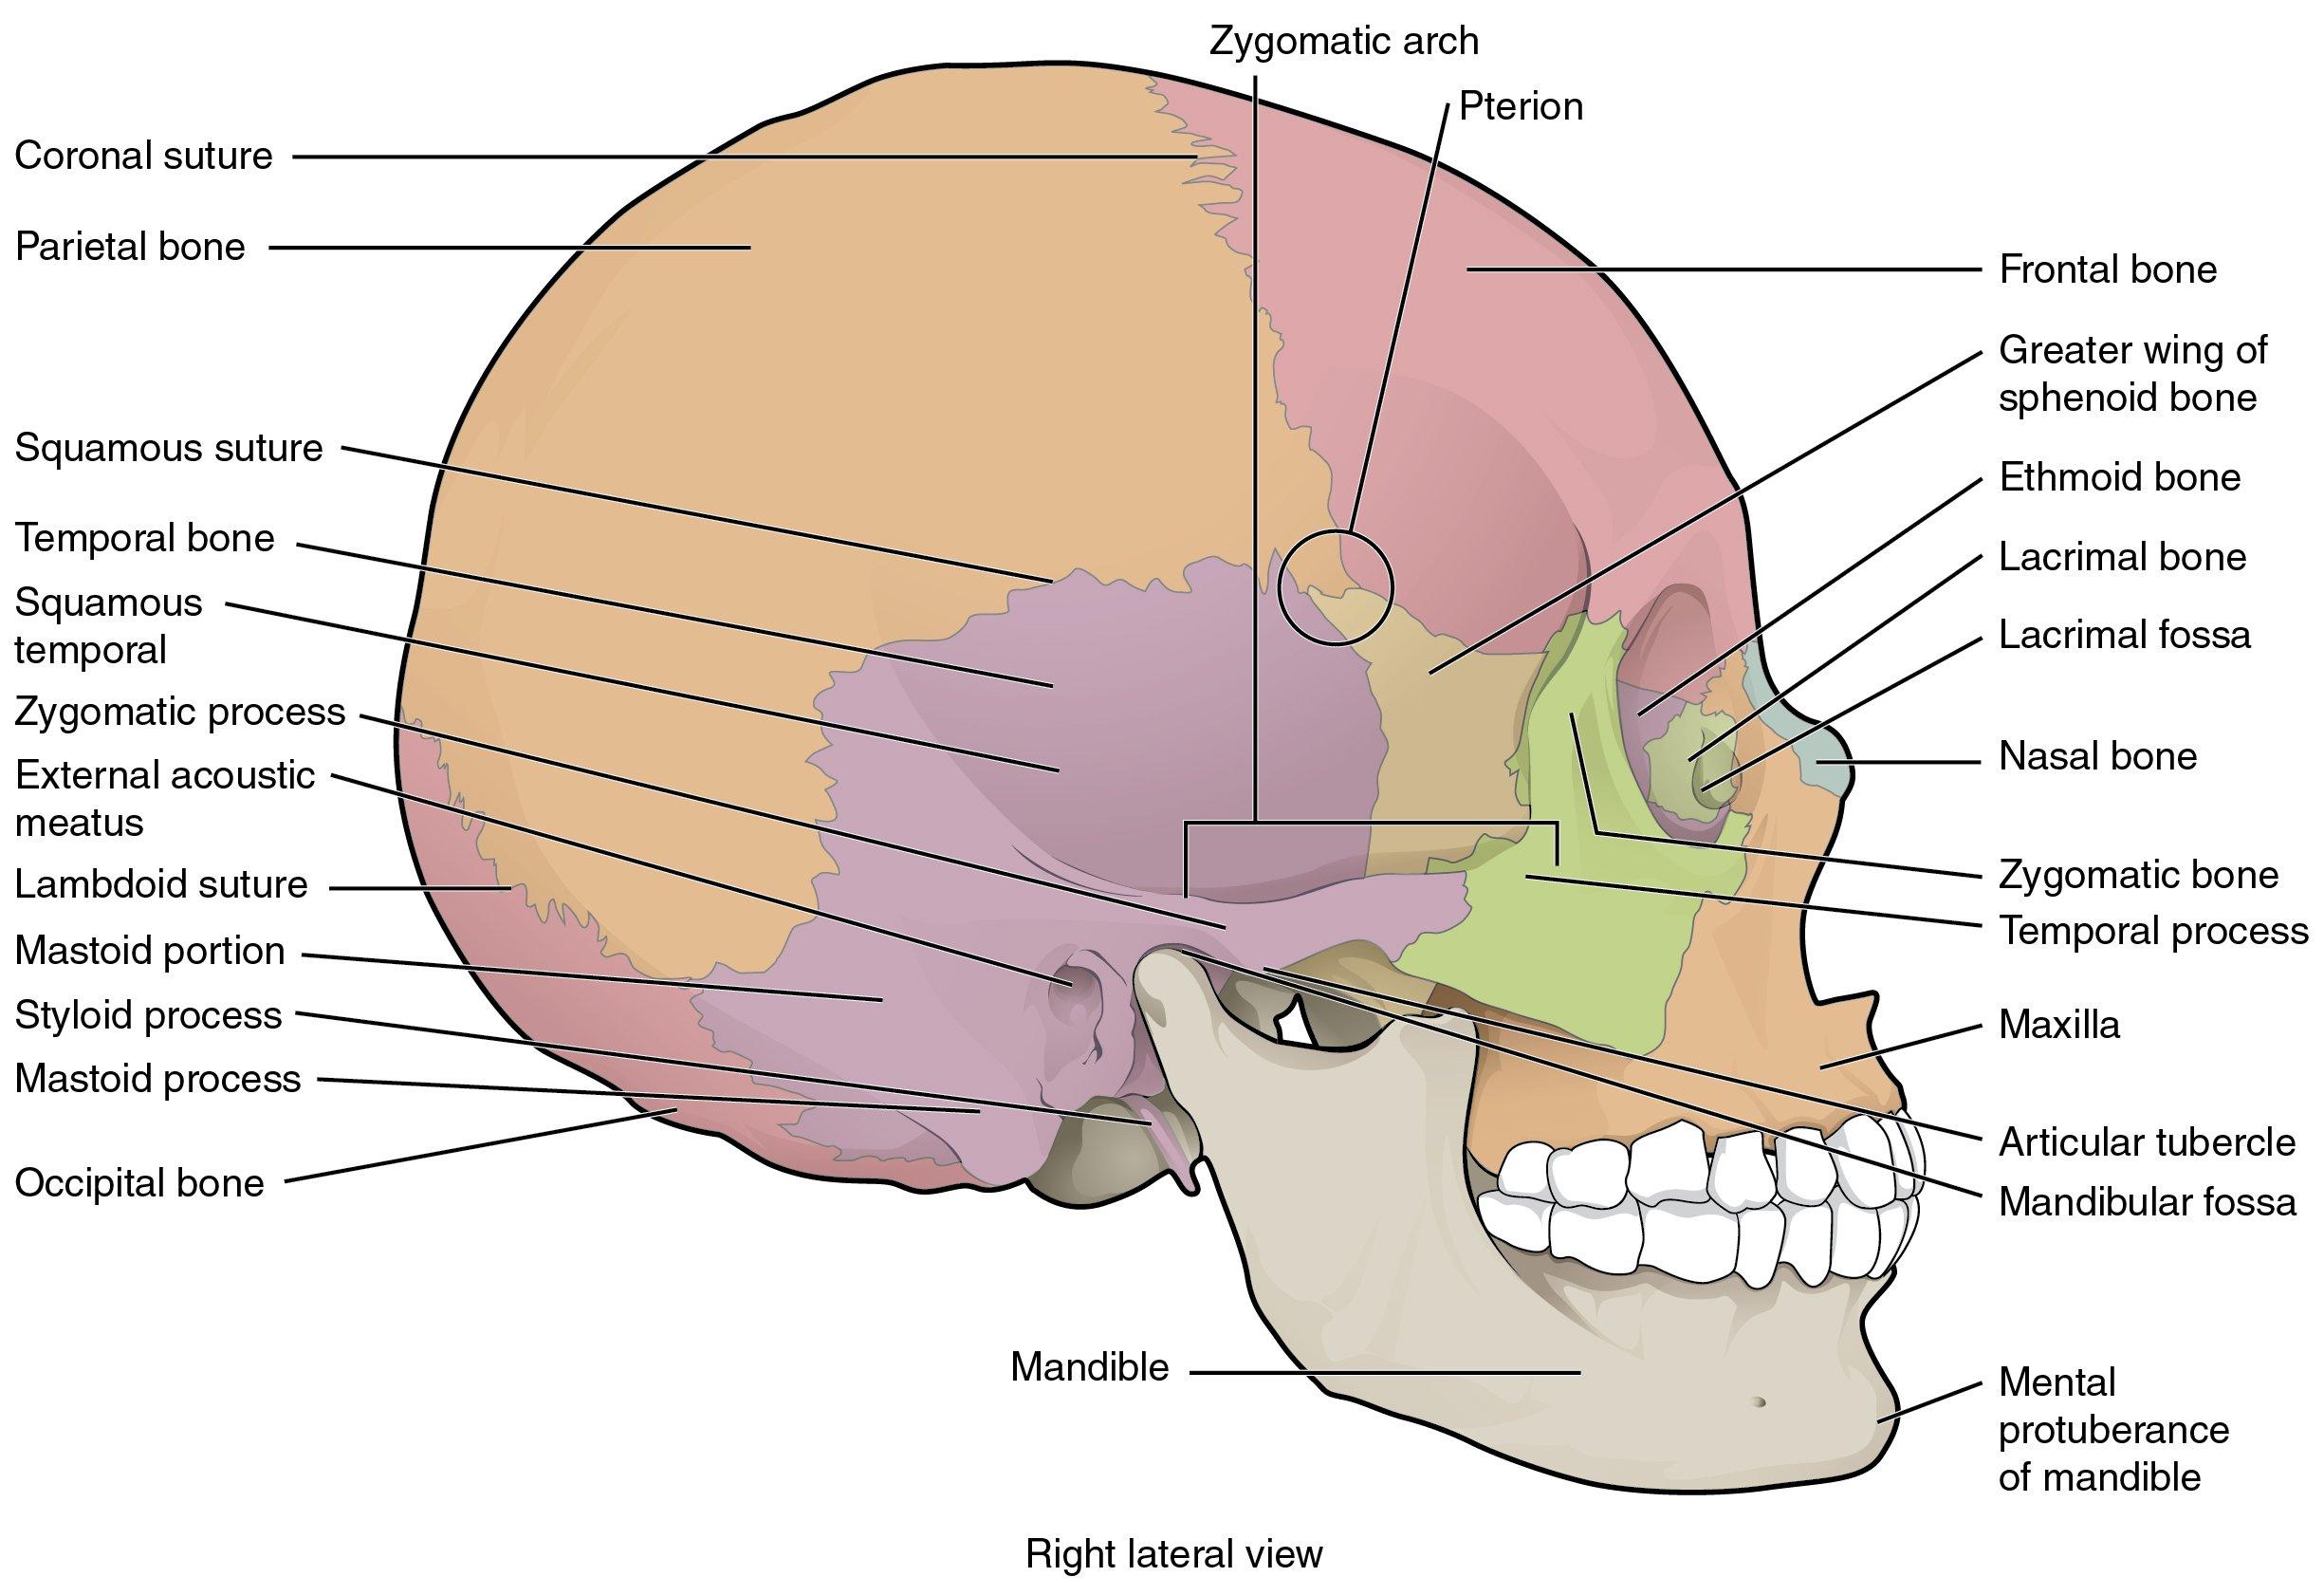 Skull Labeling Worksheet — excelguider.com